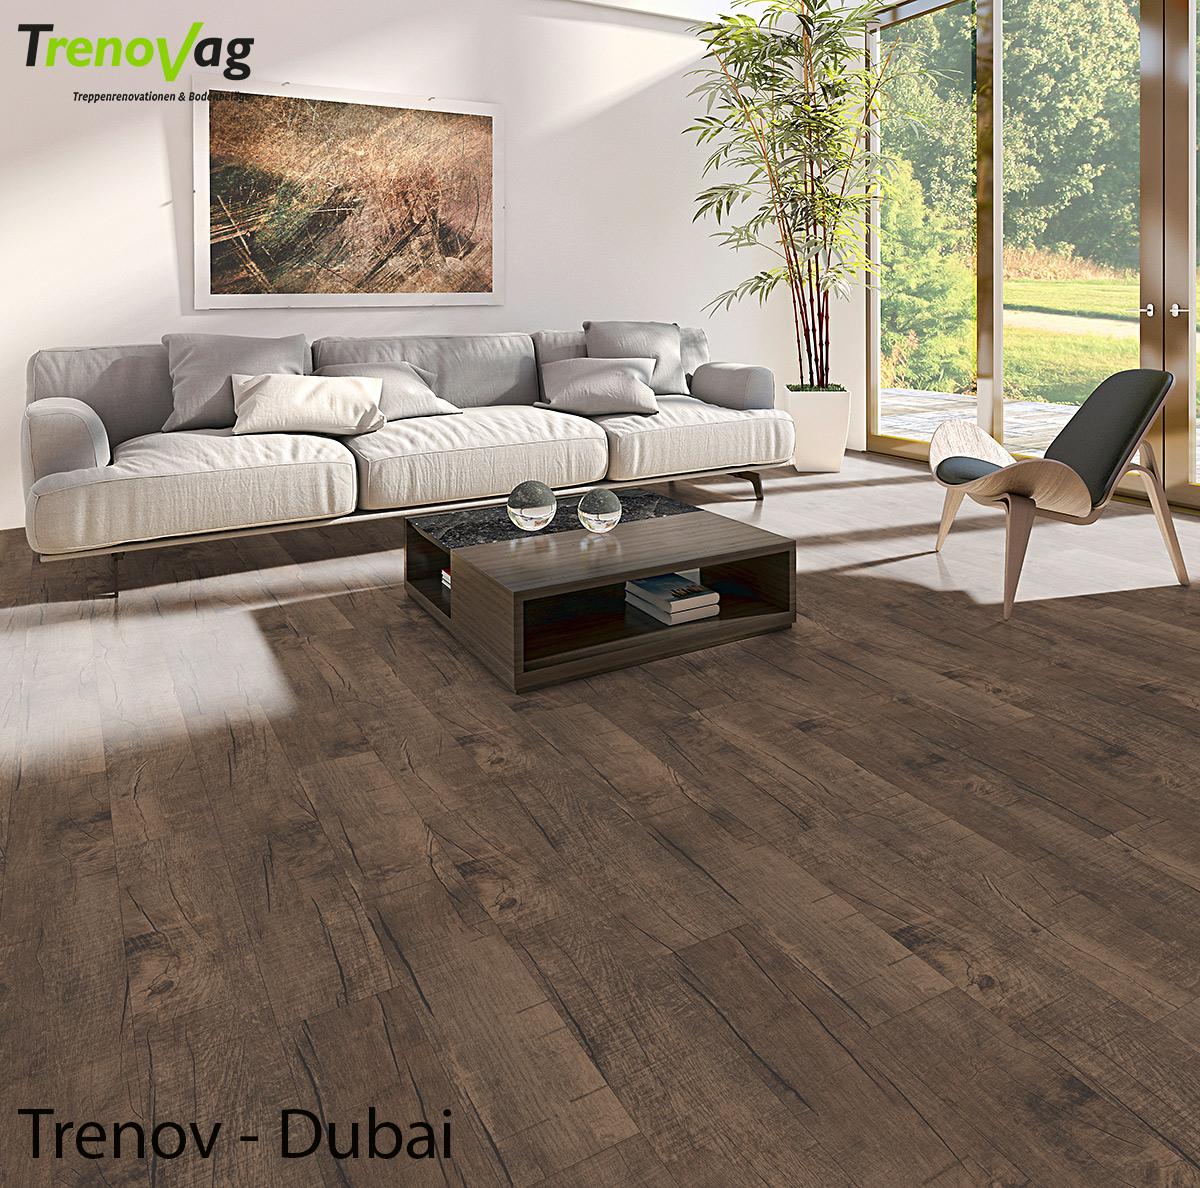 Trenov - Dubai, Vinyl, Trenov-Vinyl, Designboden, Vinylboden, Vinyl verlegen, Vinylfussboden, Boden